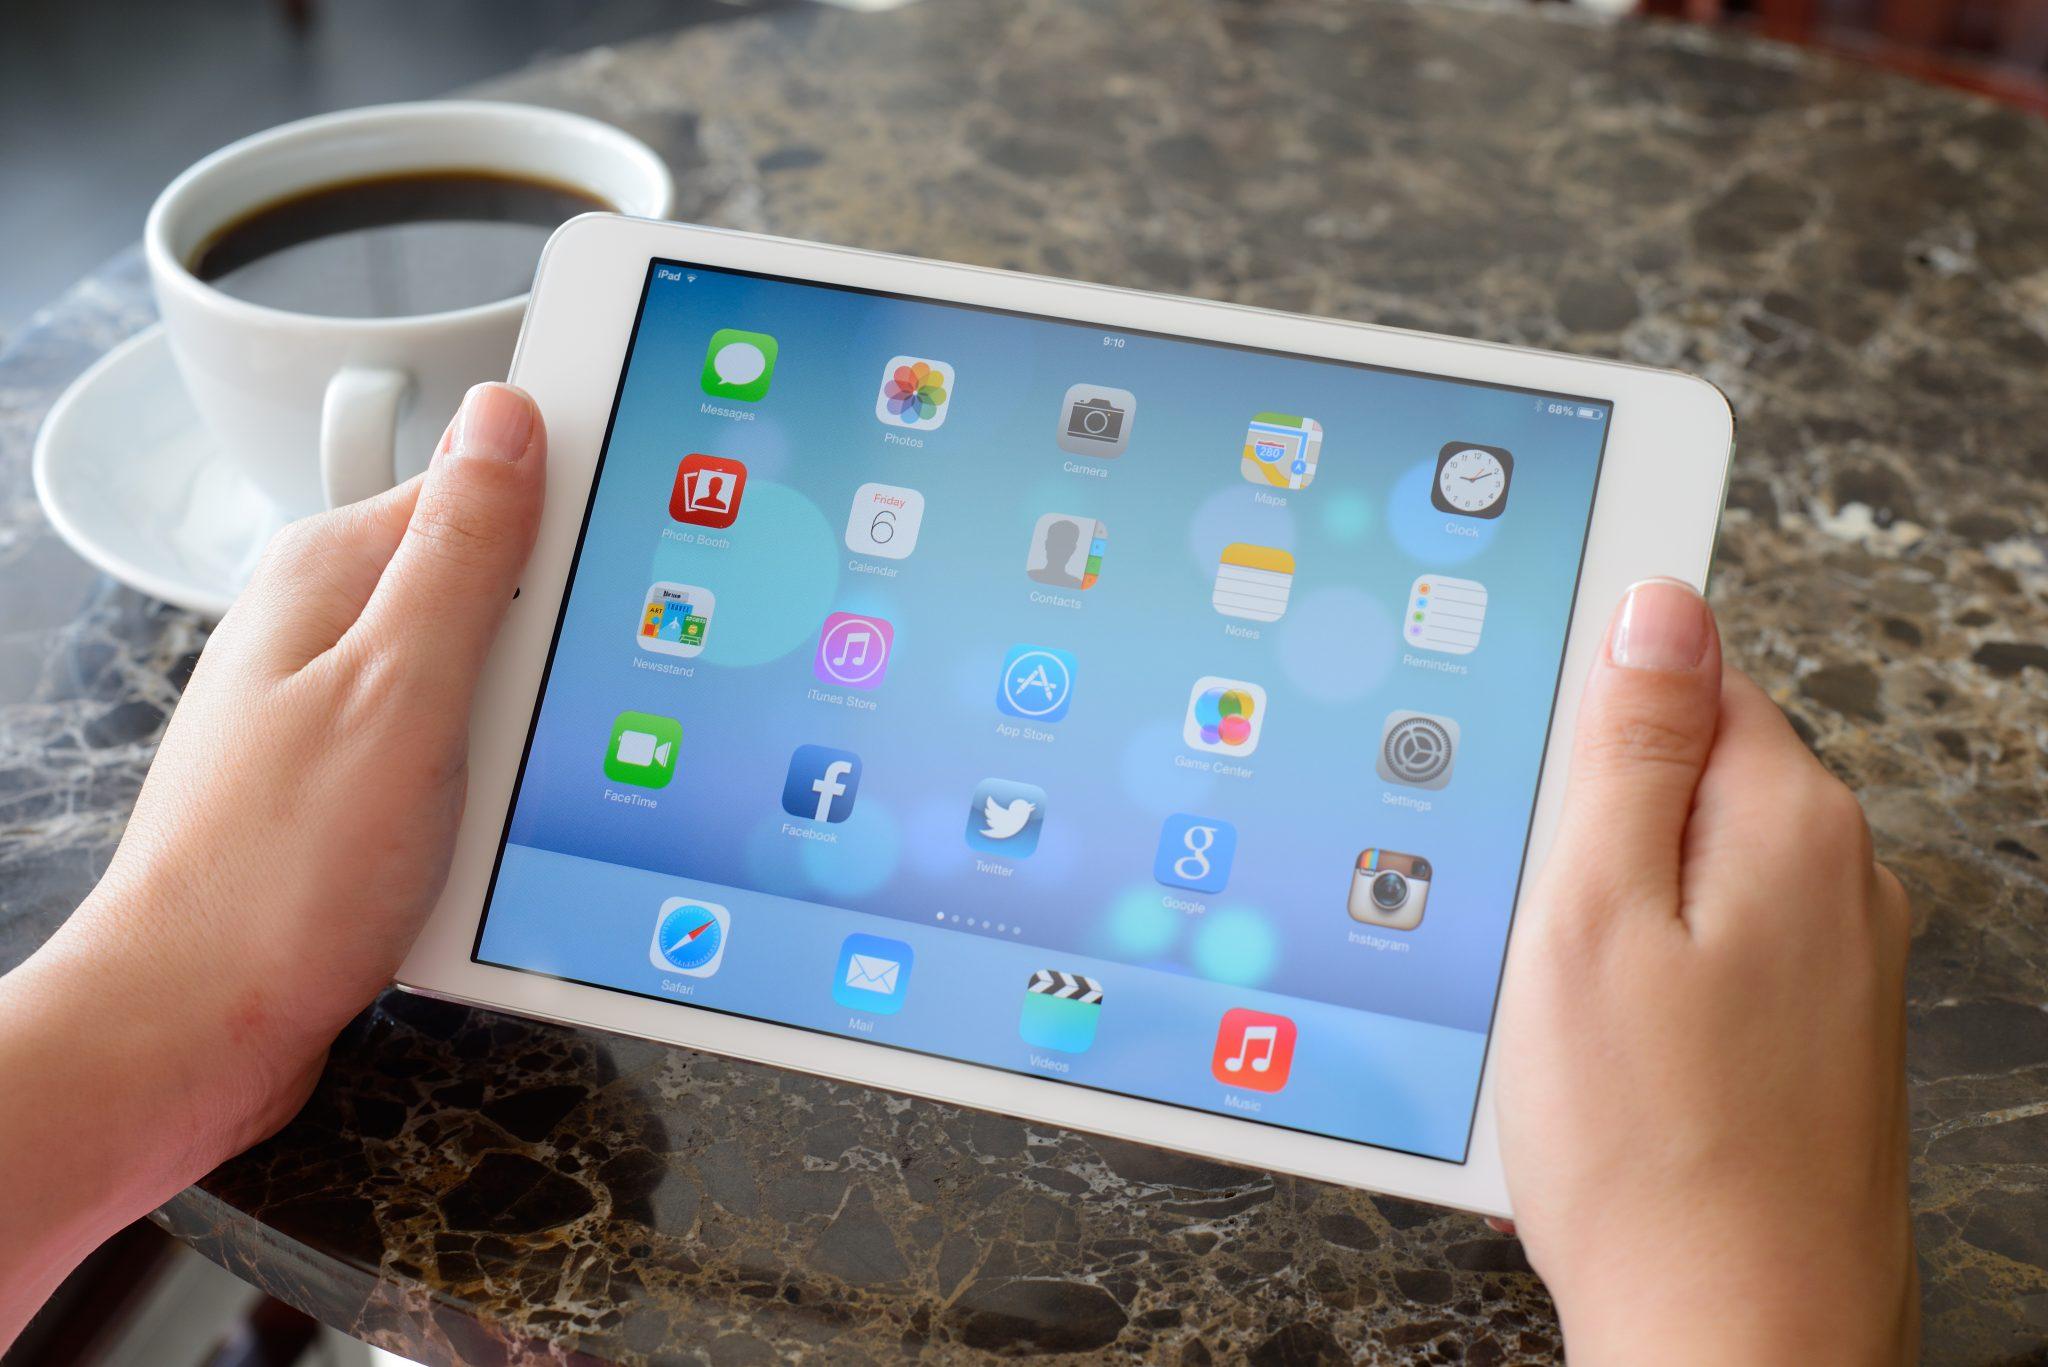 iPad mini 4 high performance